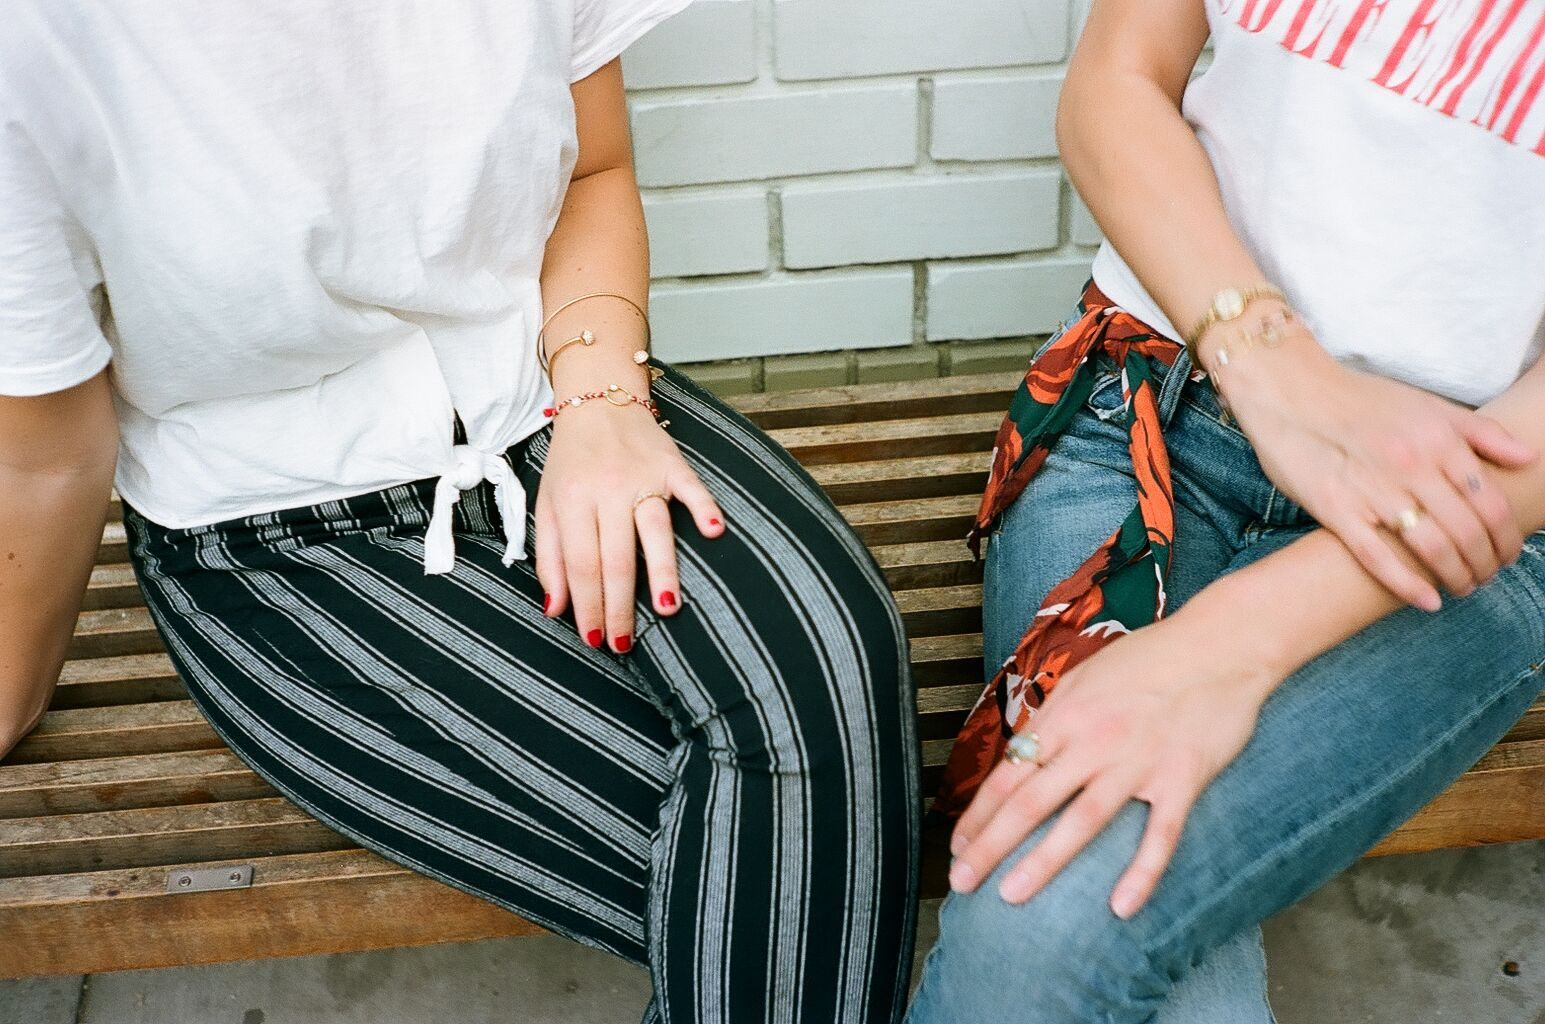 Kodak Portra 400 35mm Film Photography | SarahMichiko.com